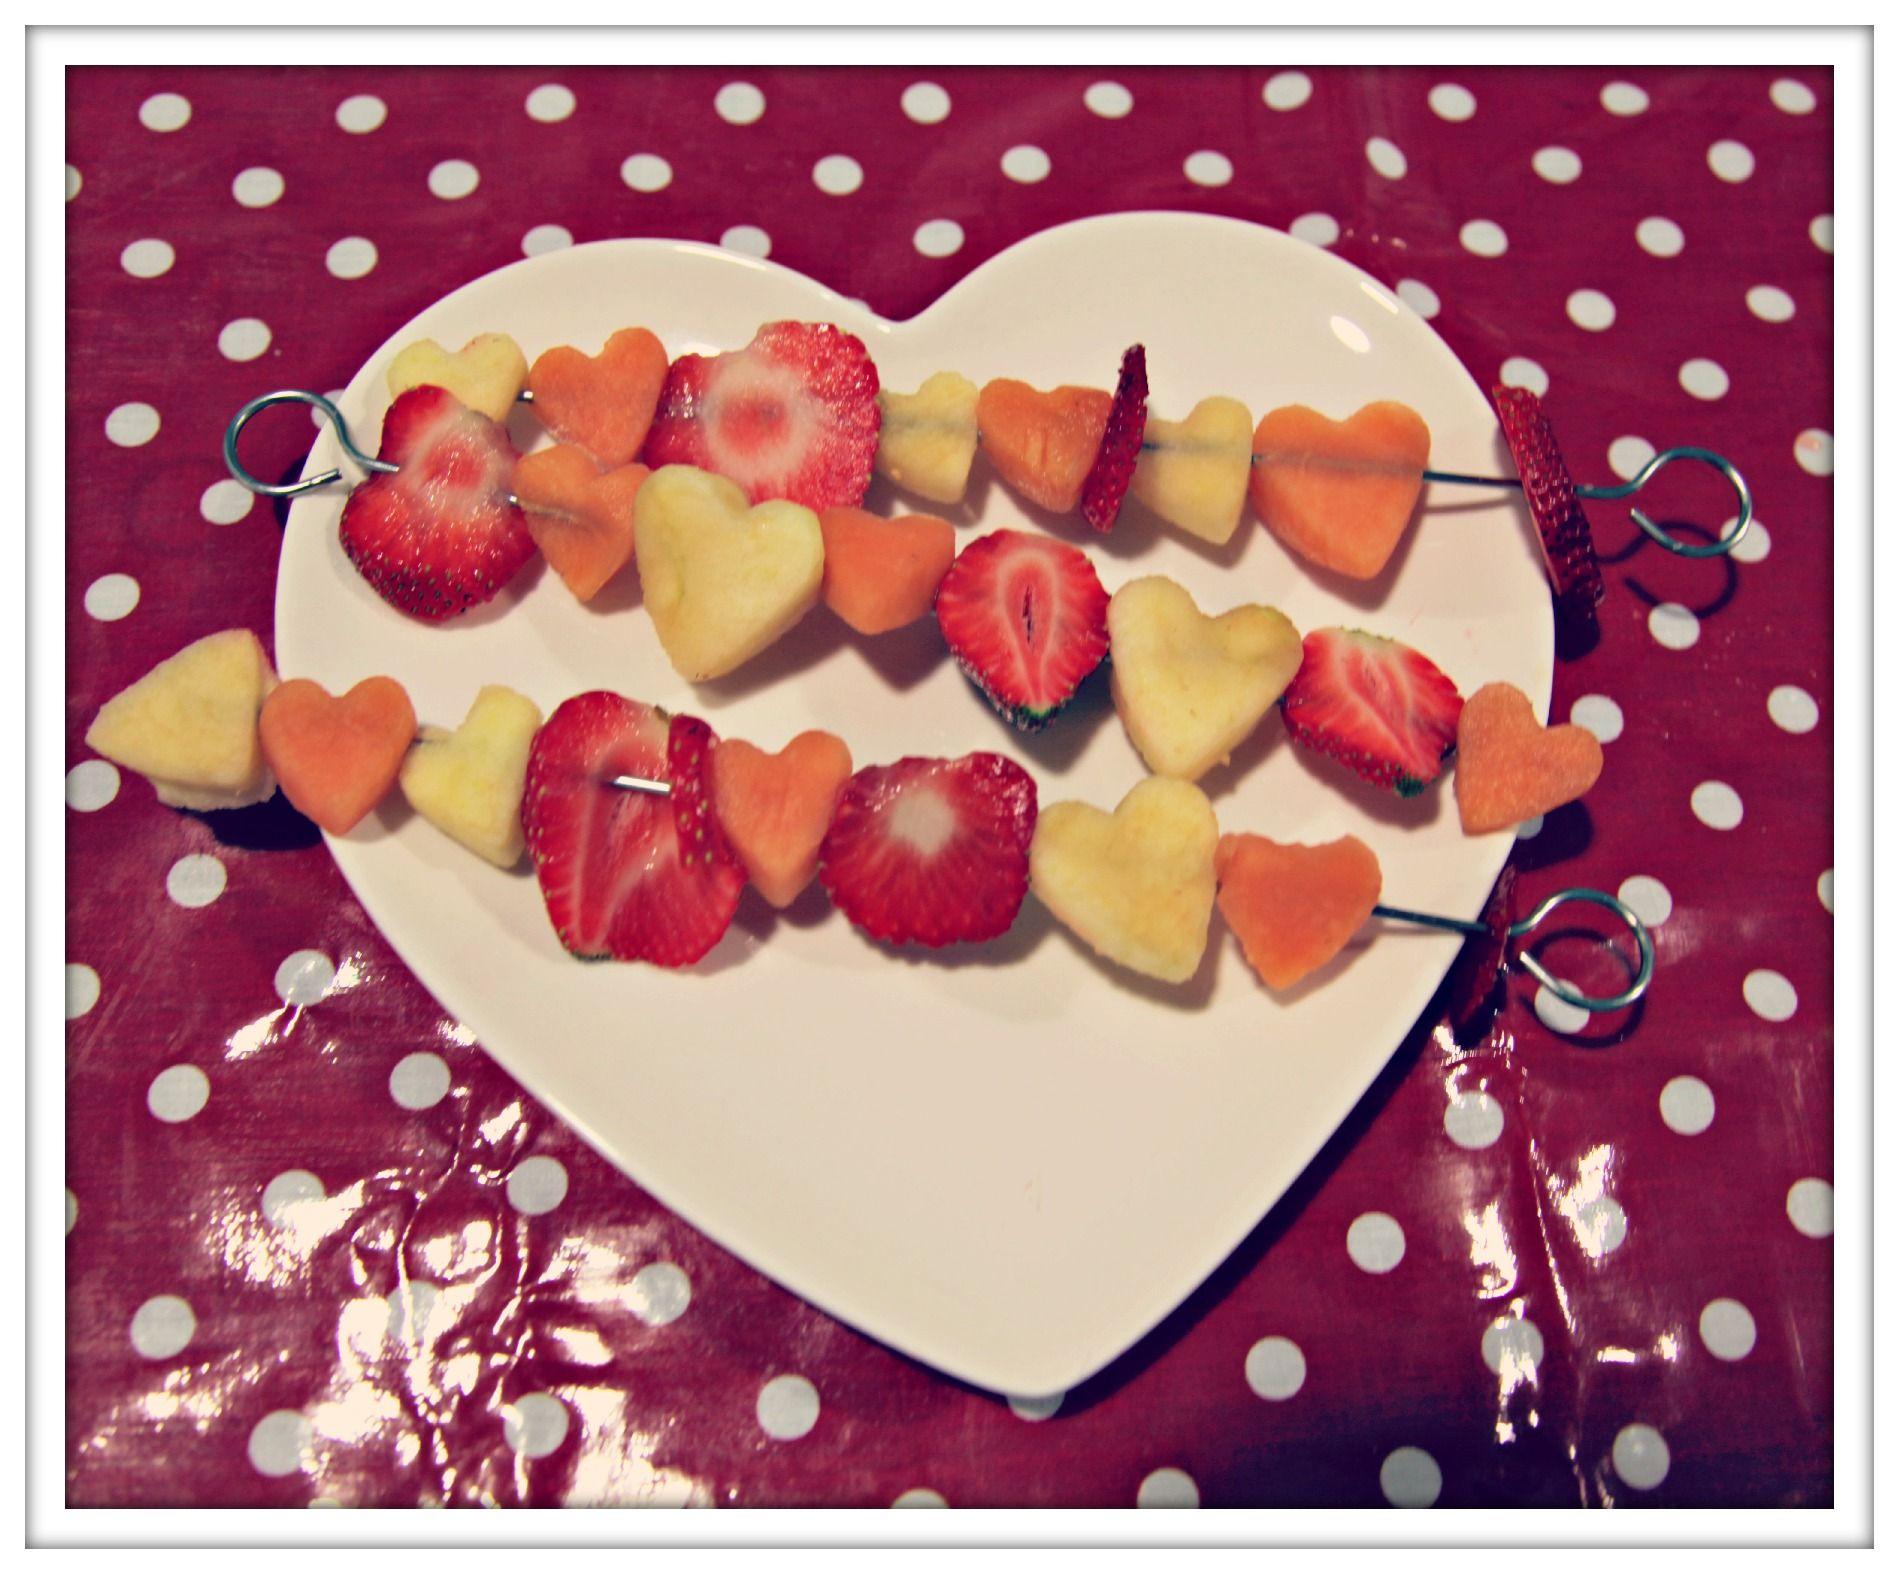 #Valentines love me fruit kebabs #LighterLife #Recipe